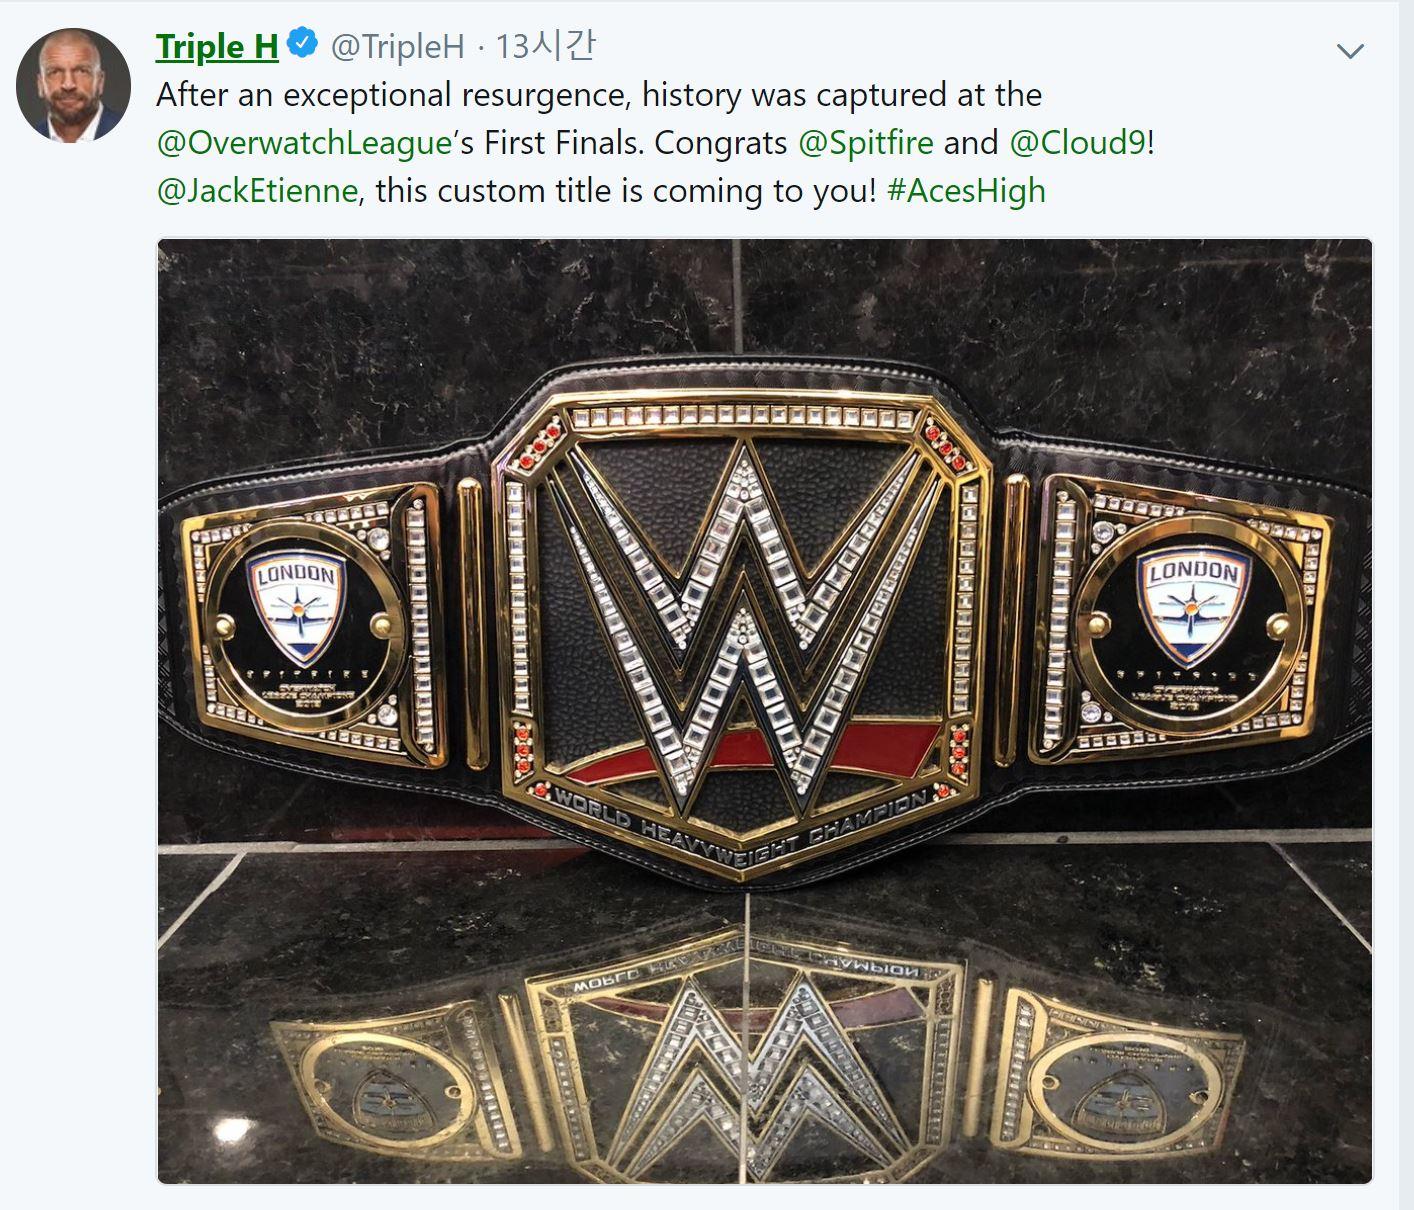 WWE가 오버워치 우승팀에게 챔피언벨트를 보낸 이유는?